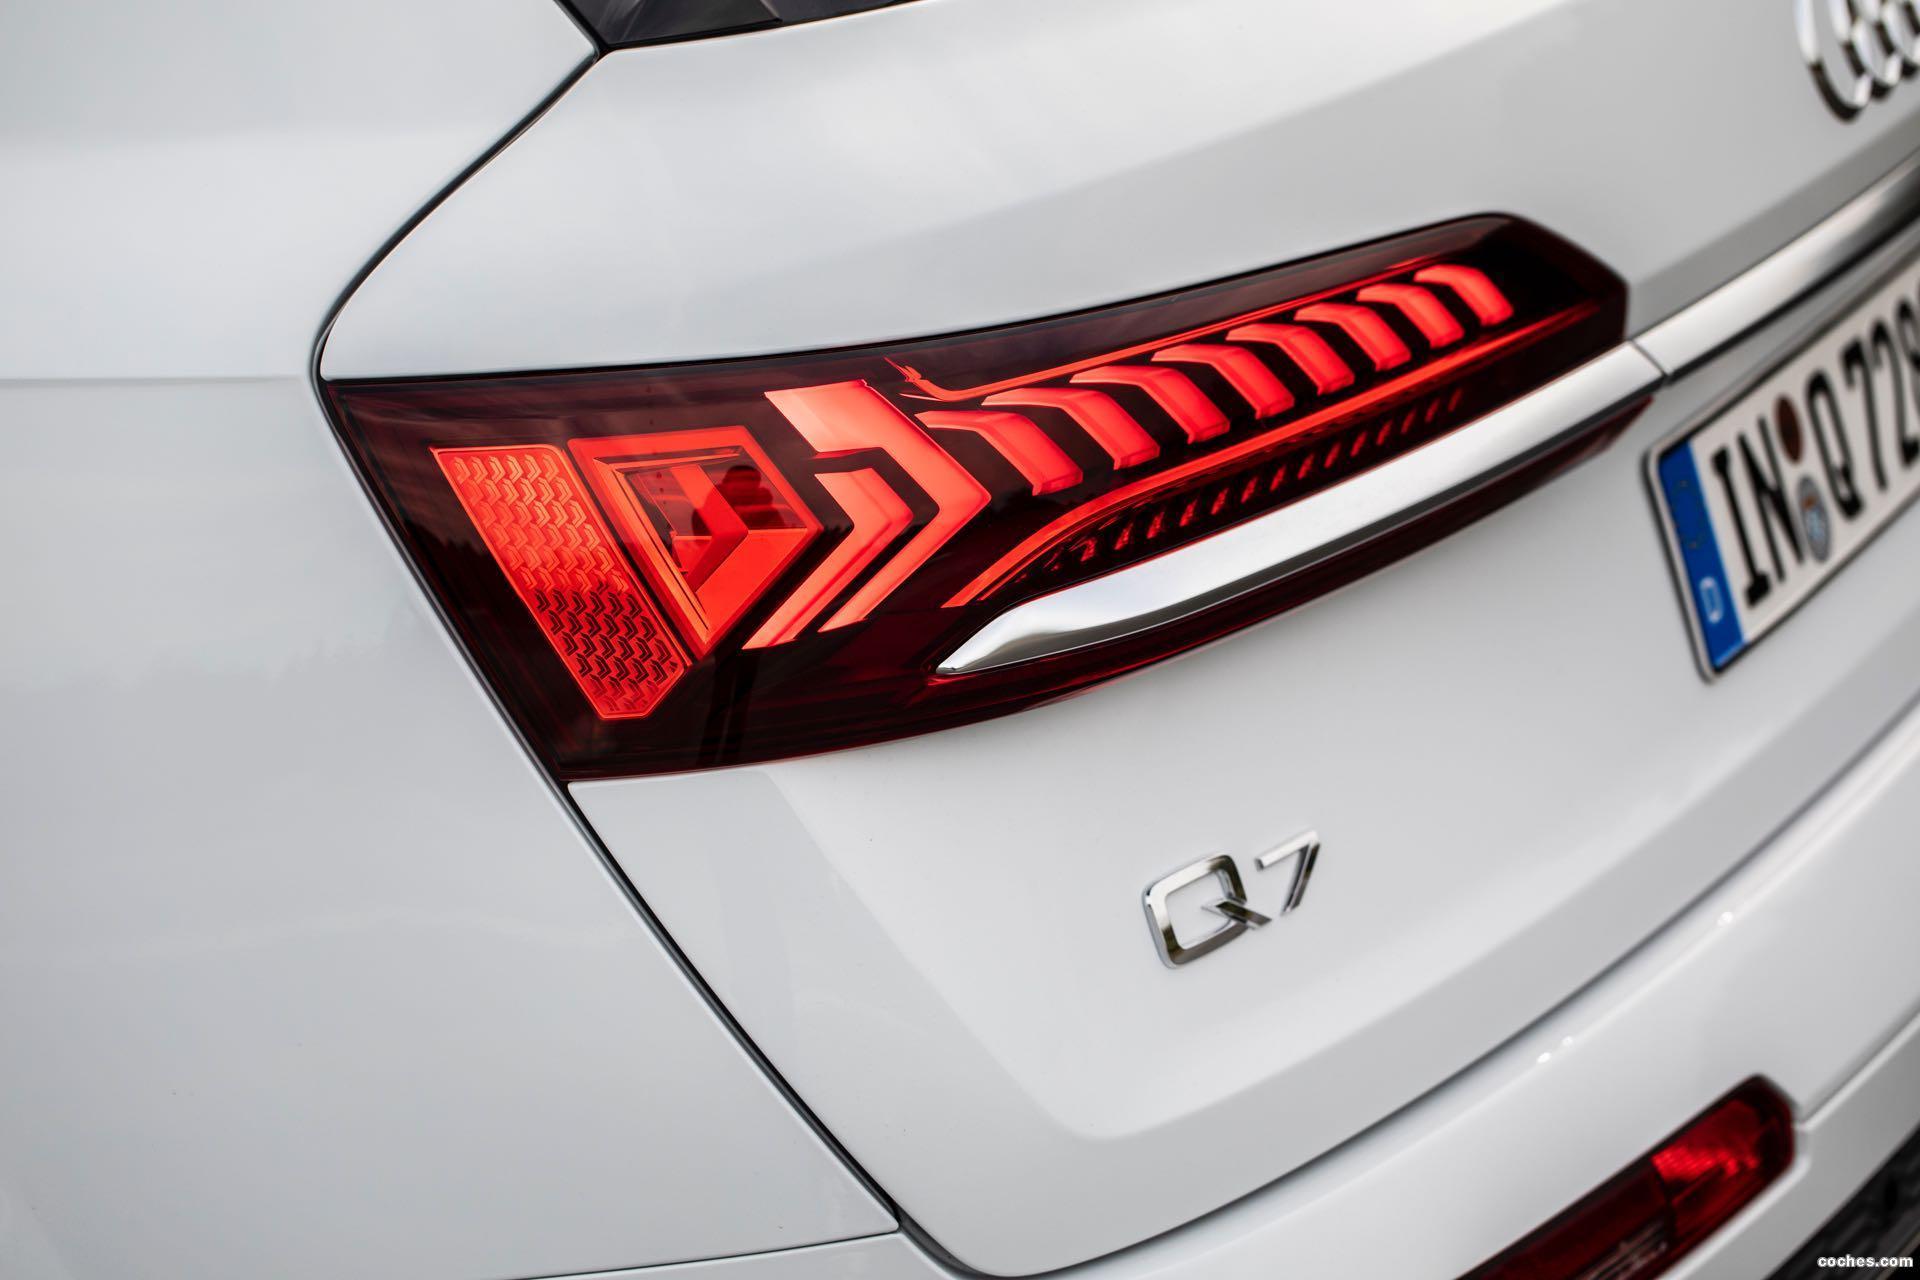 Foto 21 de Audi Q7 60 TFSIe quattro S line 2020